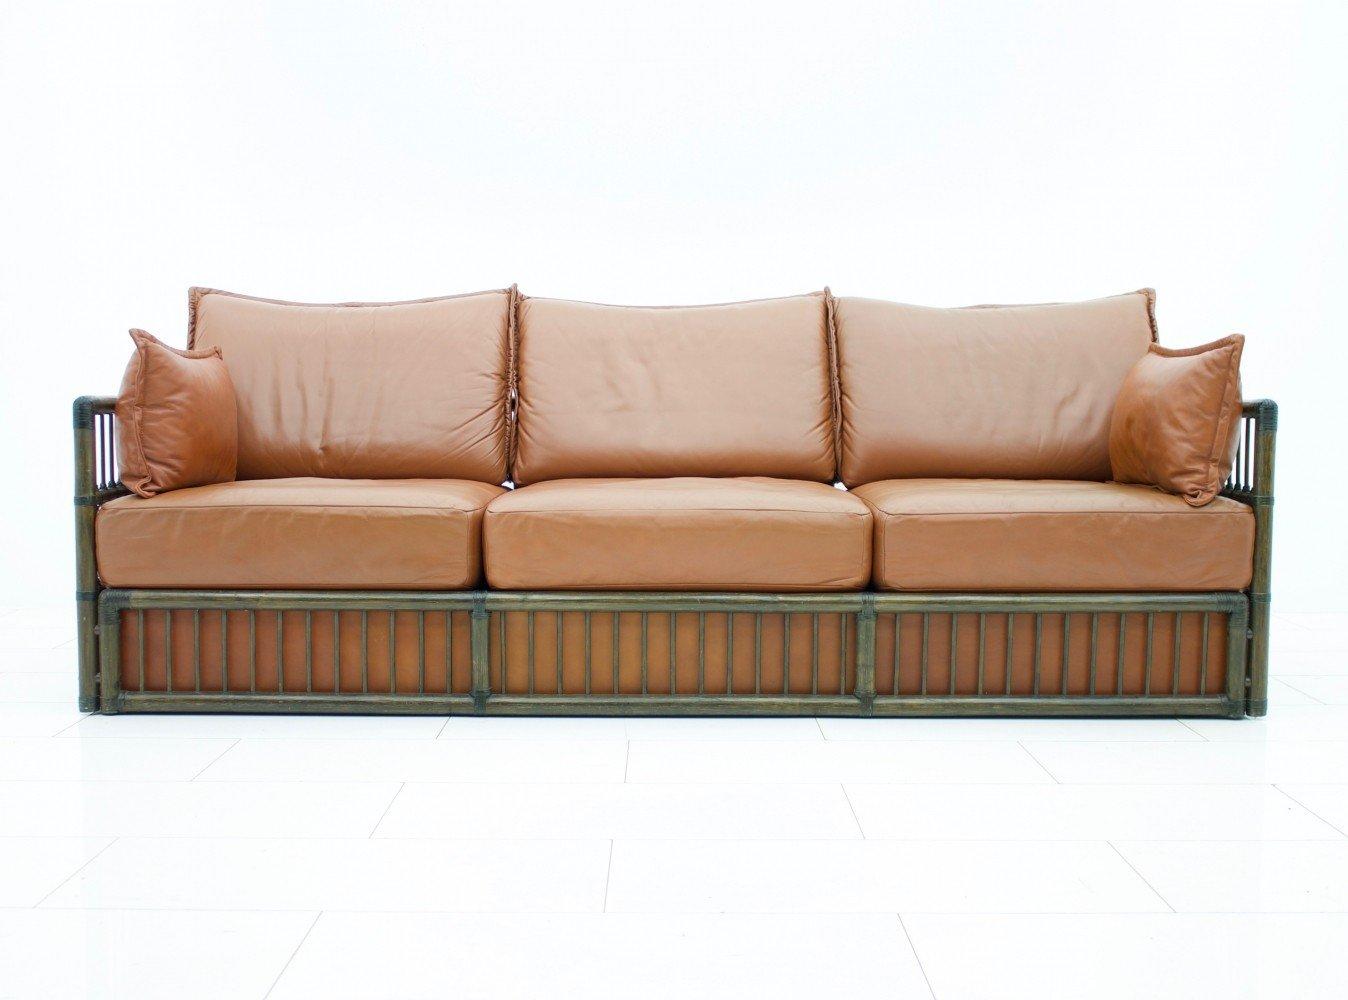 Sofa Set Within 6000